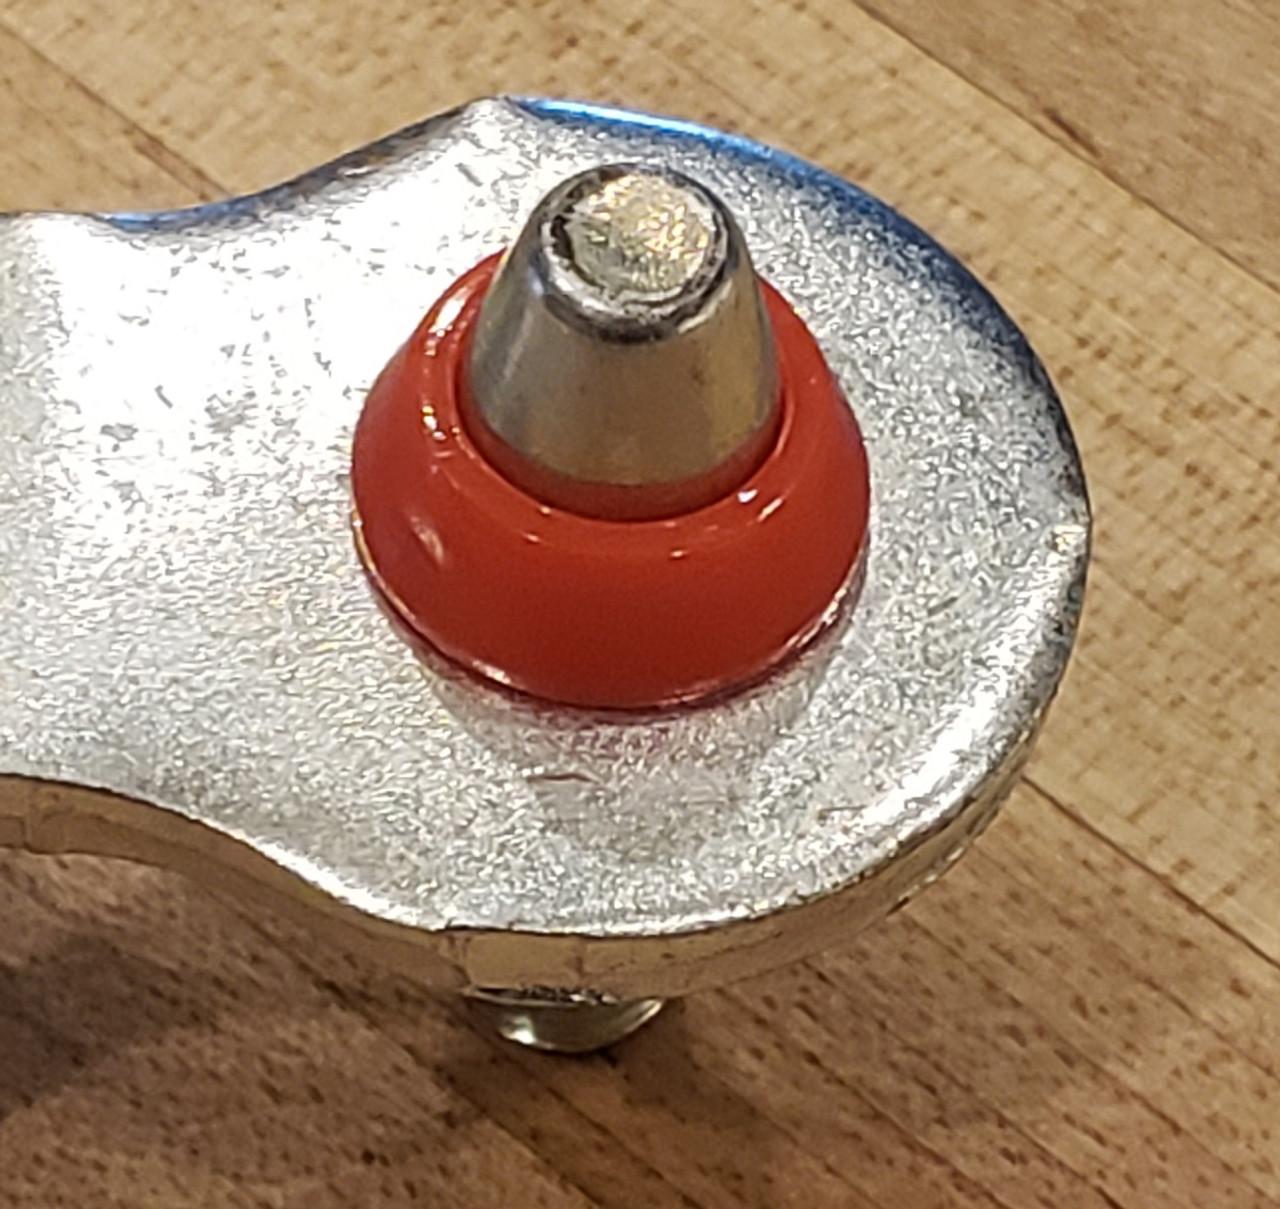 Mercury Commuter FA1KIT™ Transmission Shift Lever / Linkage Replacement Bushing Kit fits onto pin as shown.